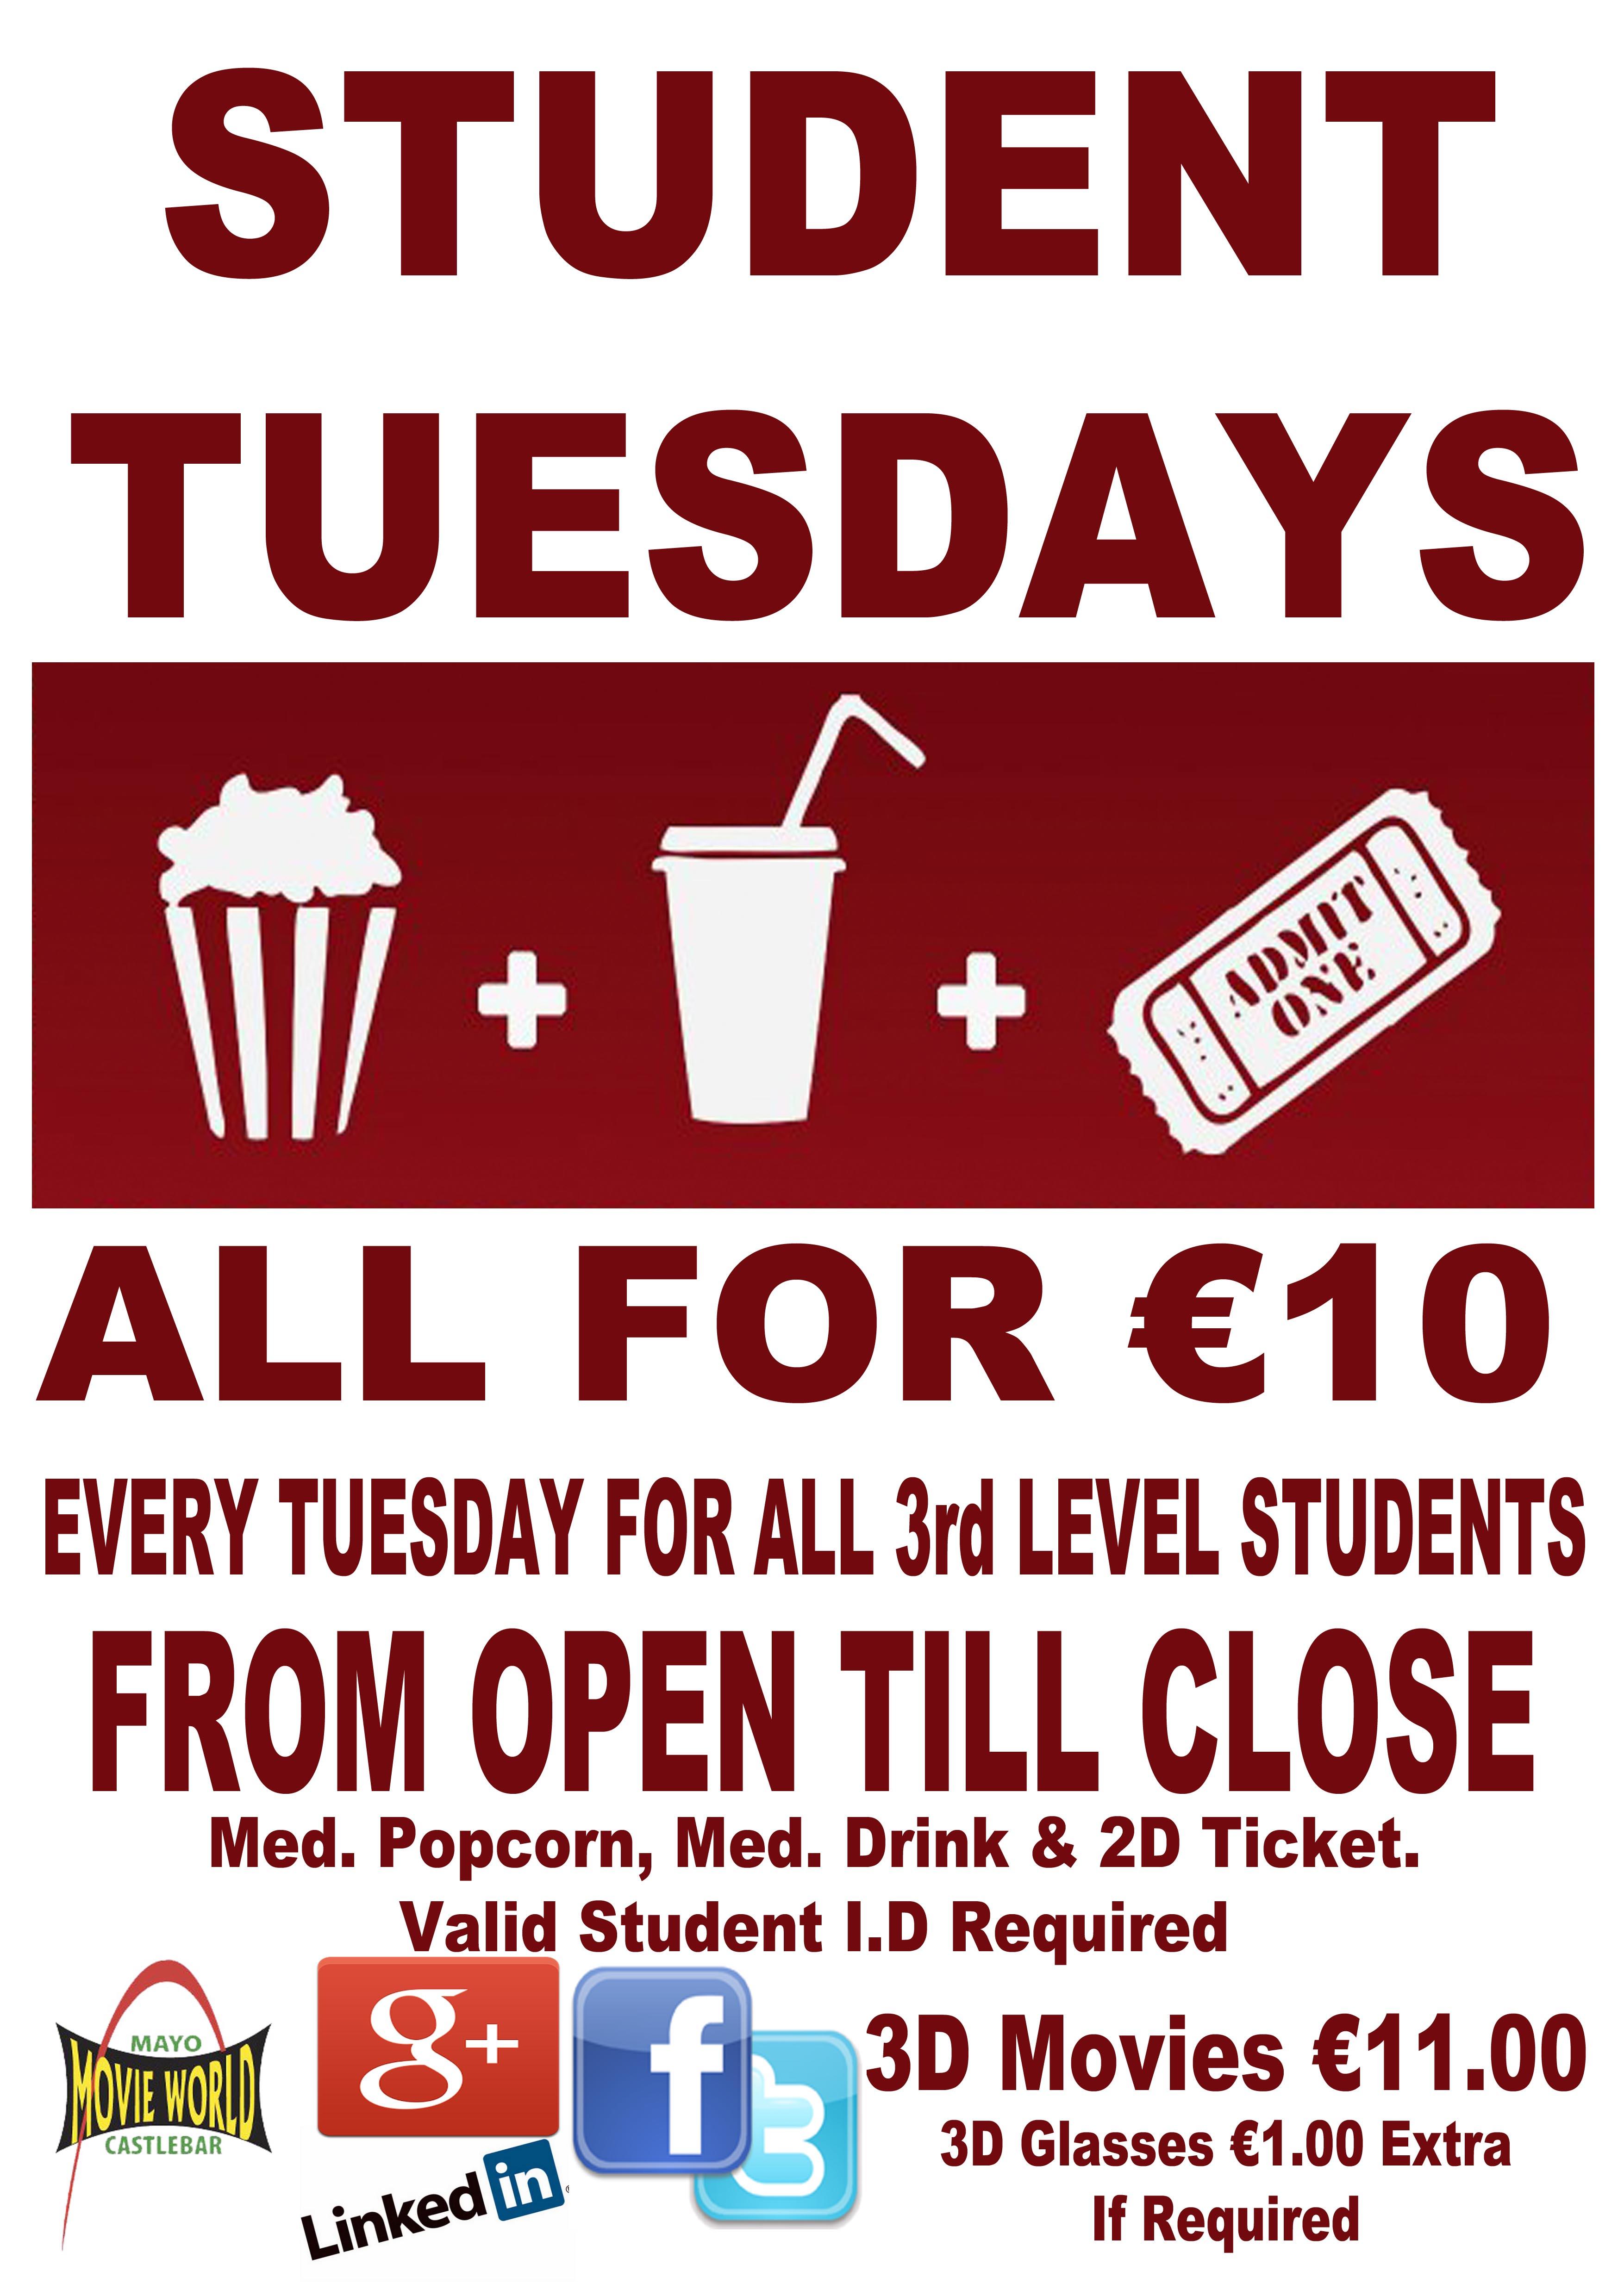 Student_Tuesday_4.jpg